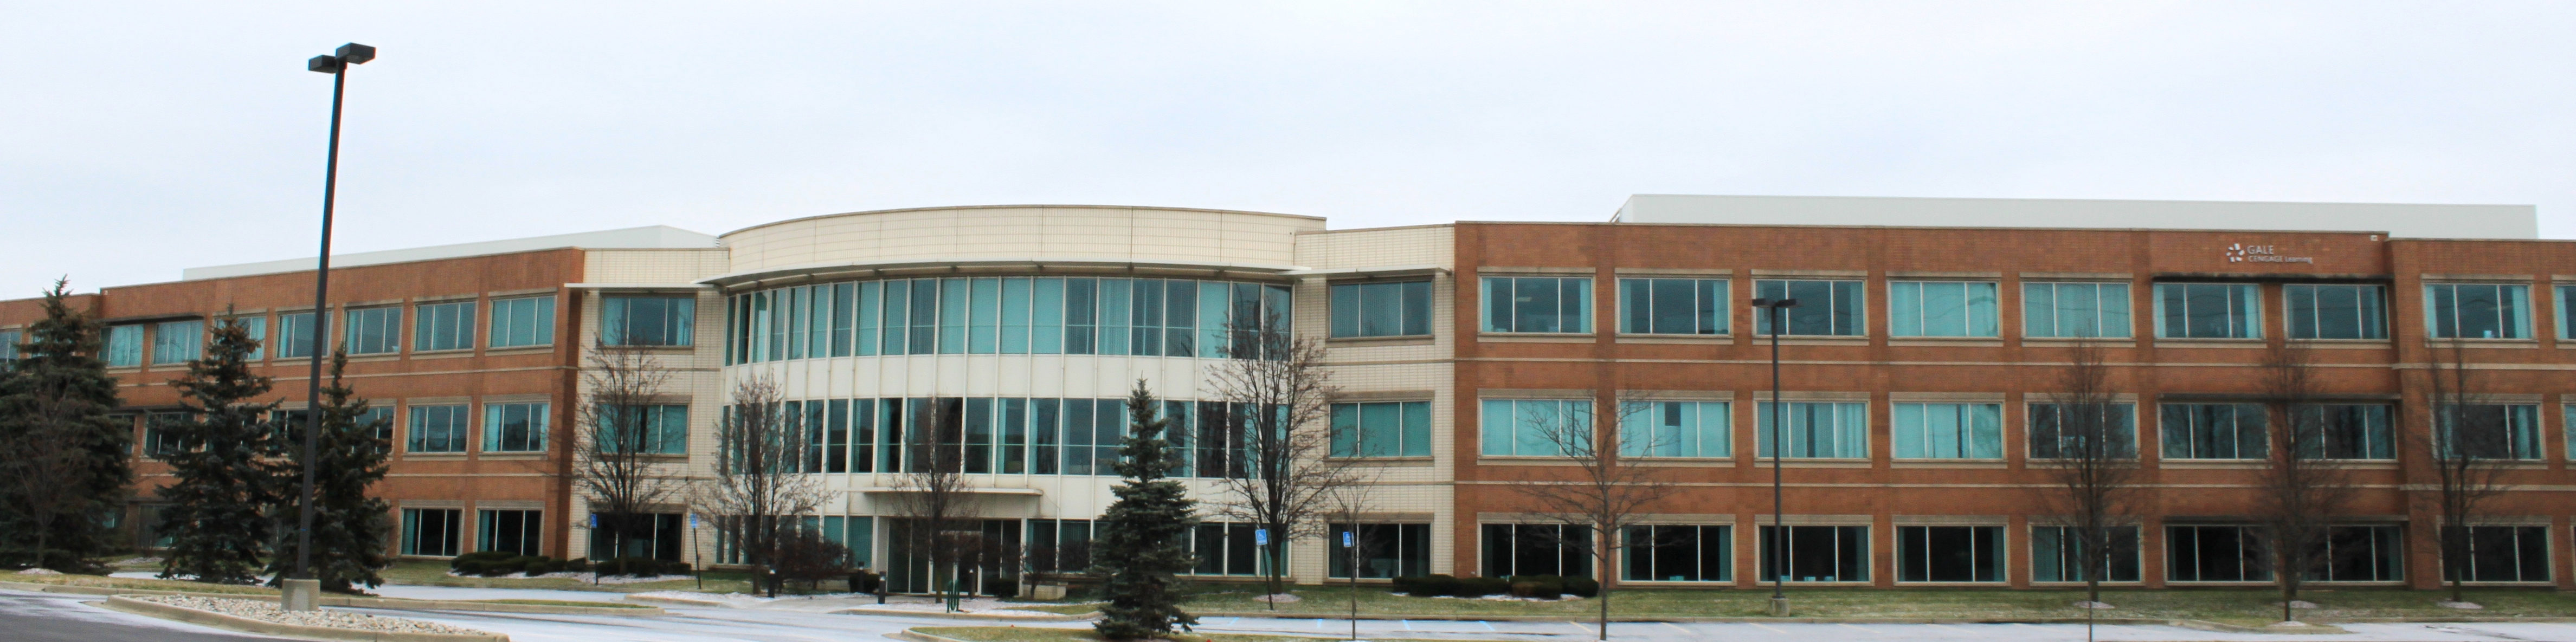 File:Gale Cengage Headquarters Building Farmington Hills Michigan ...